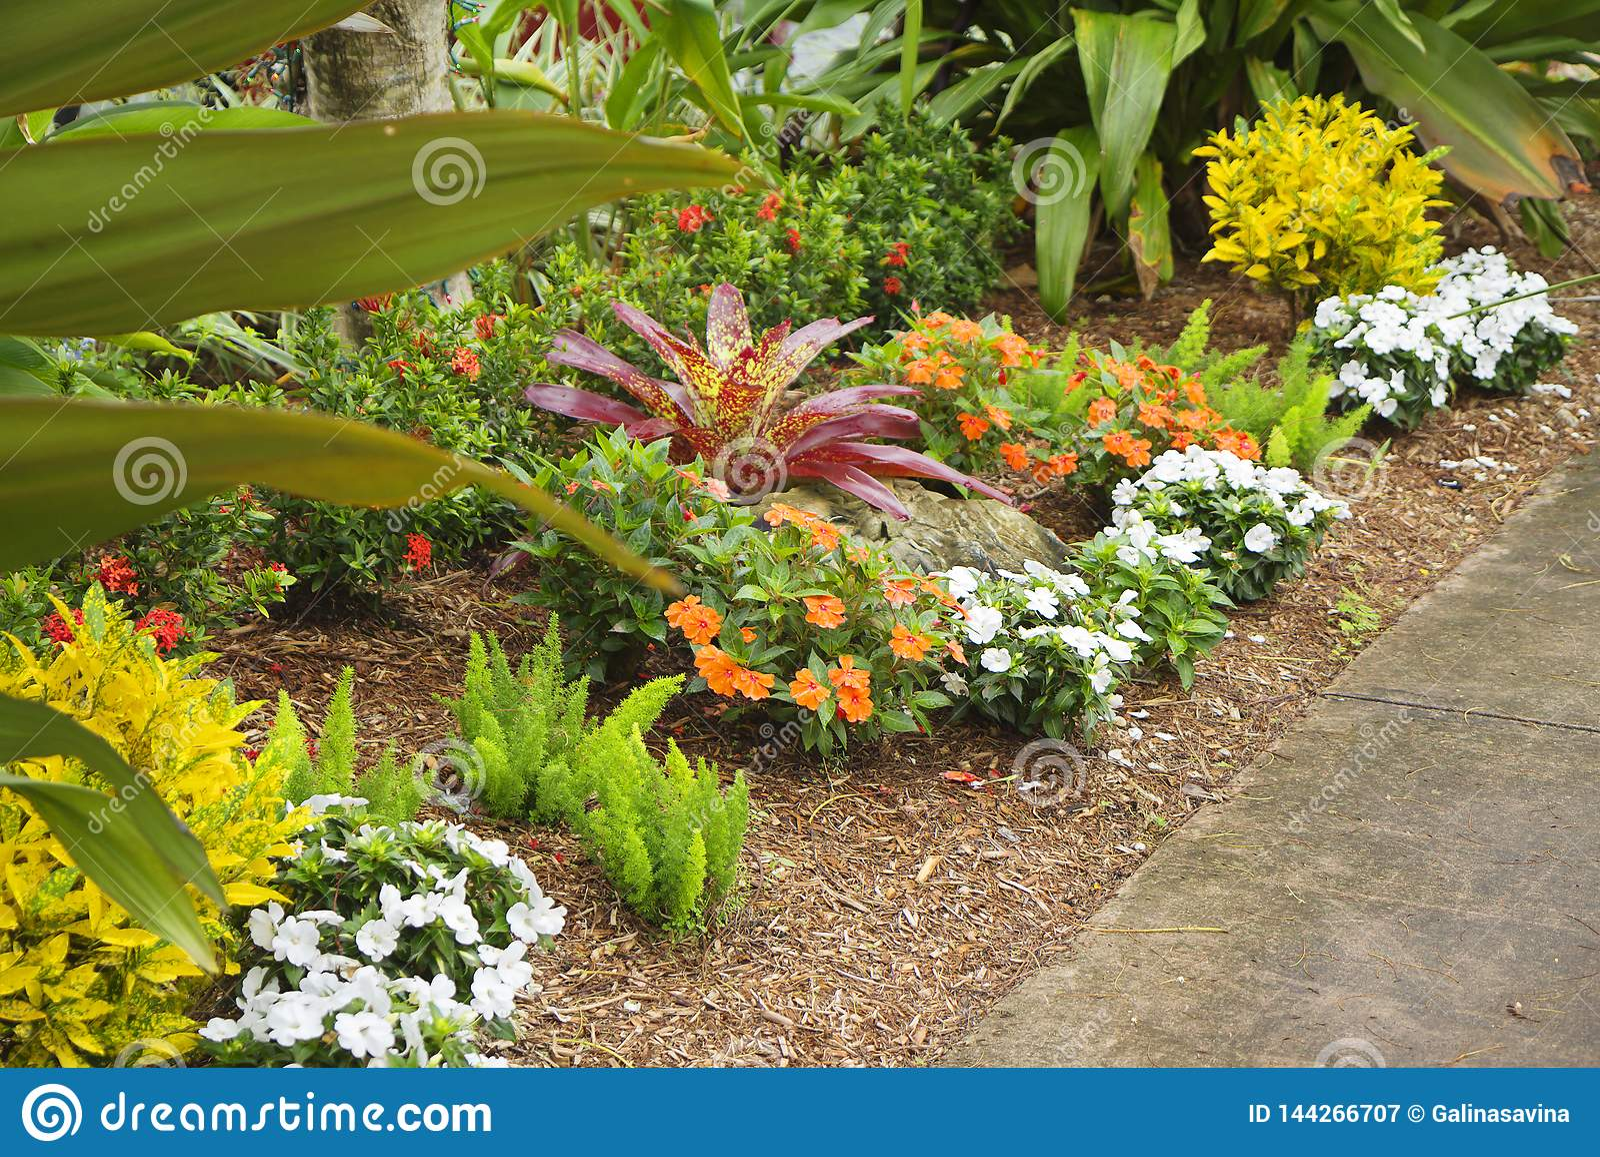 Coral Gables Florida Usa Landscaping Near Biltmore Hotel Stock